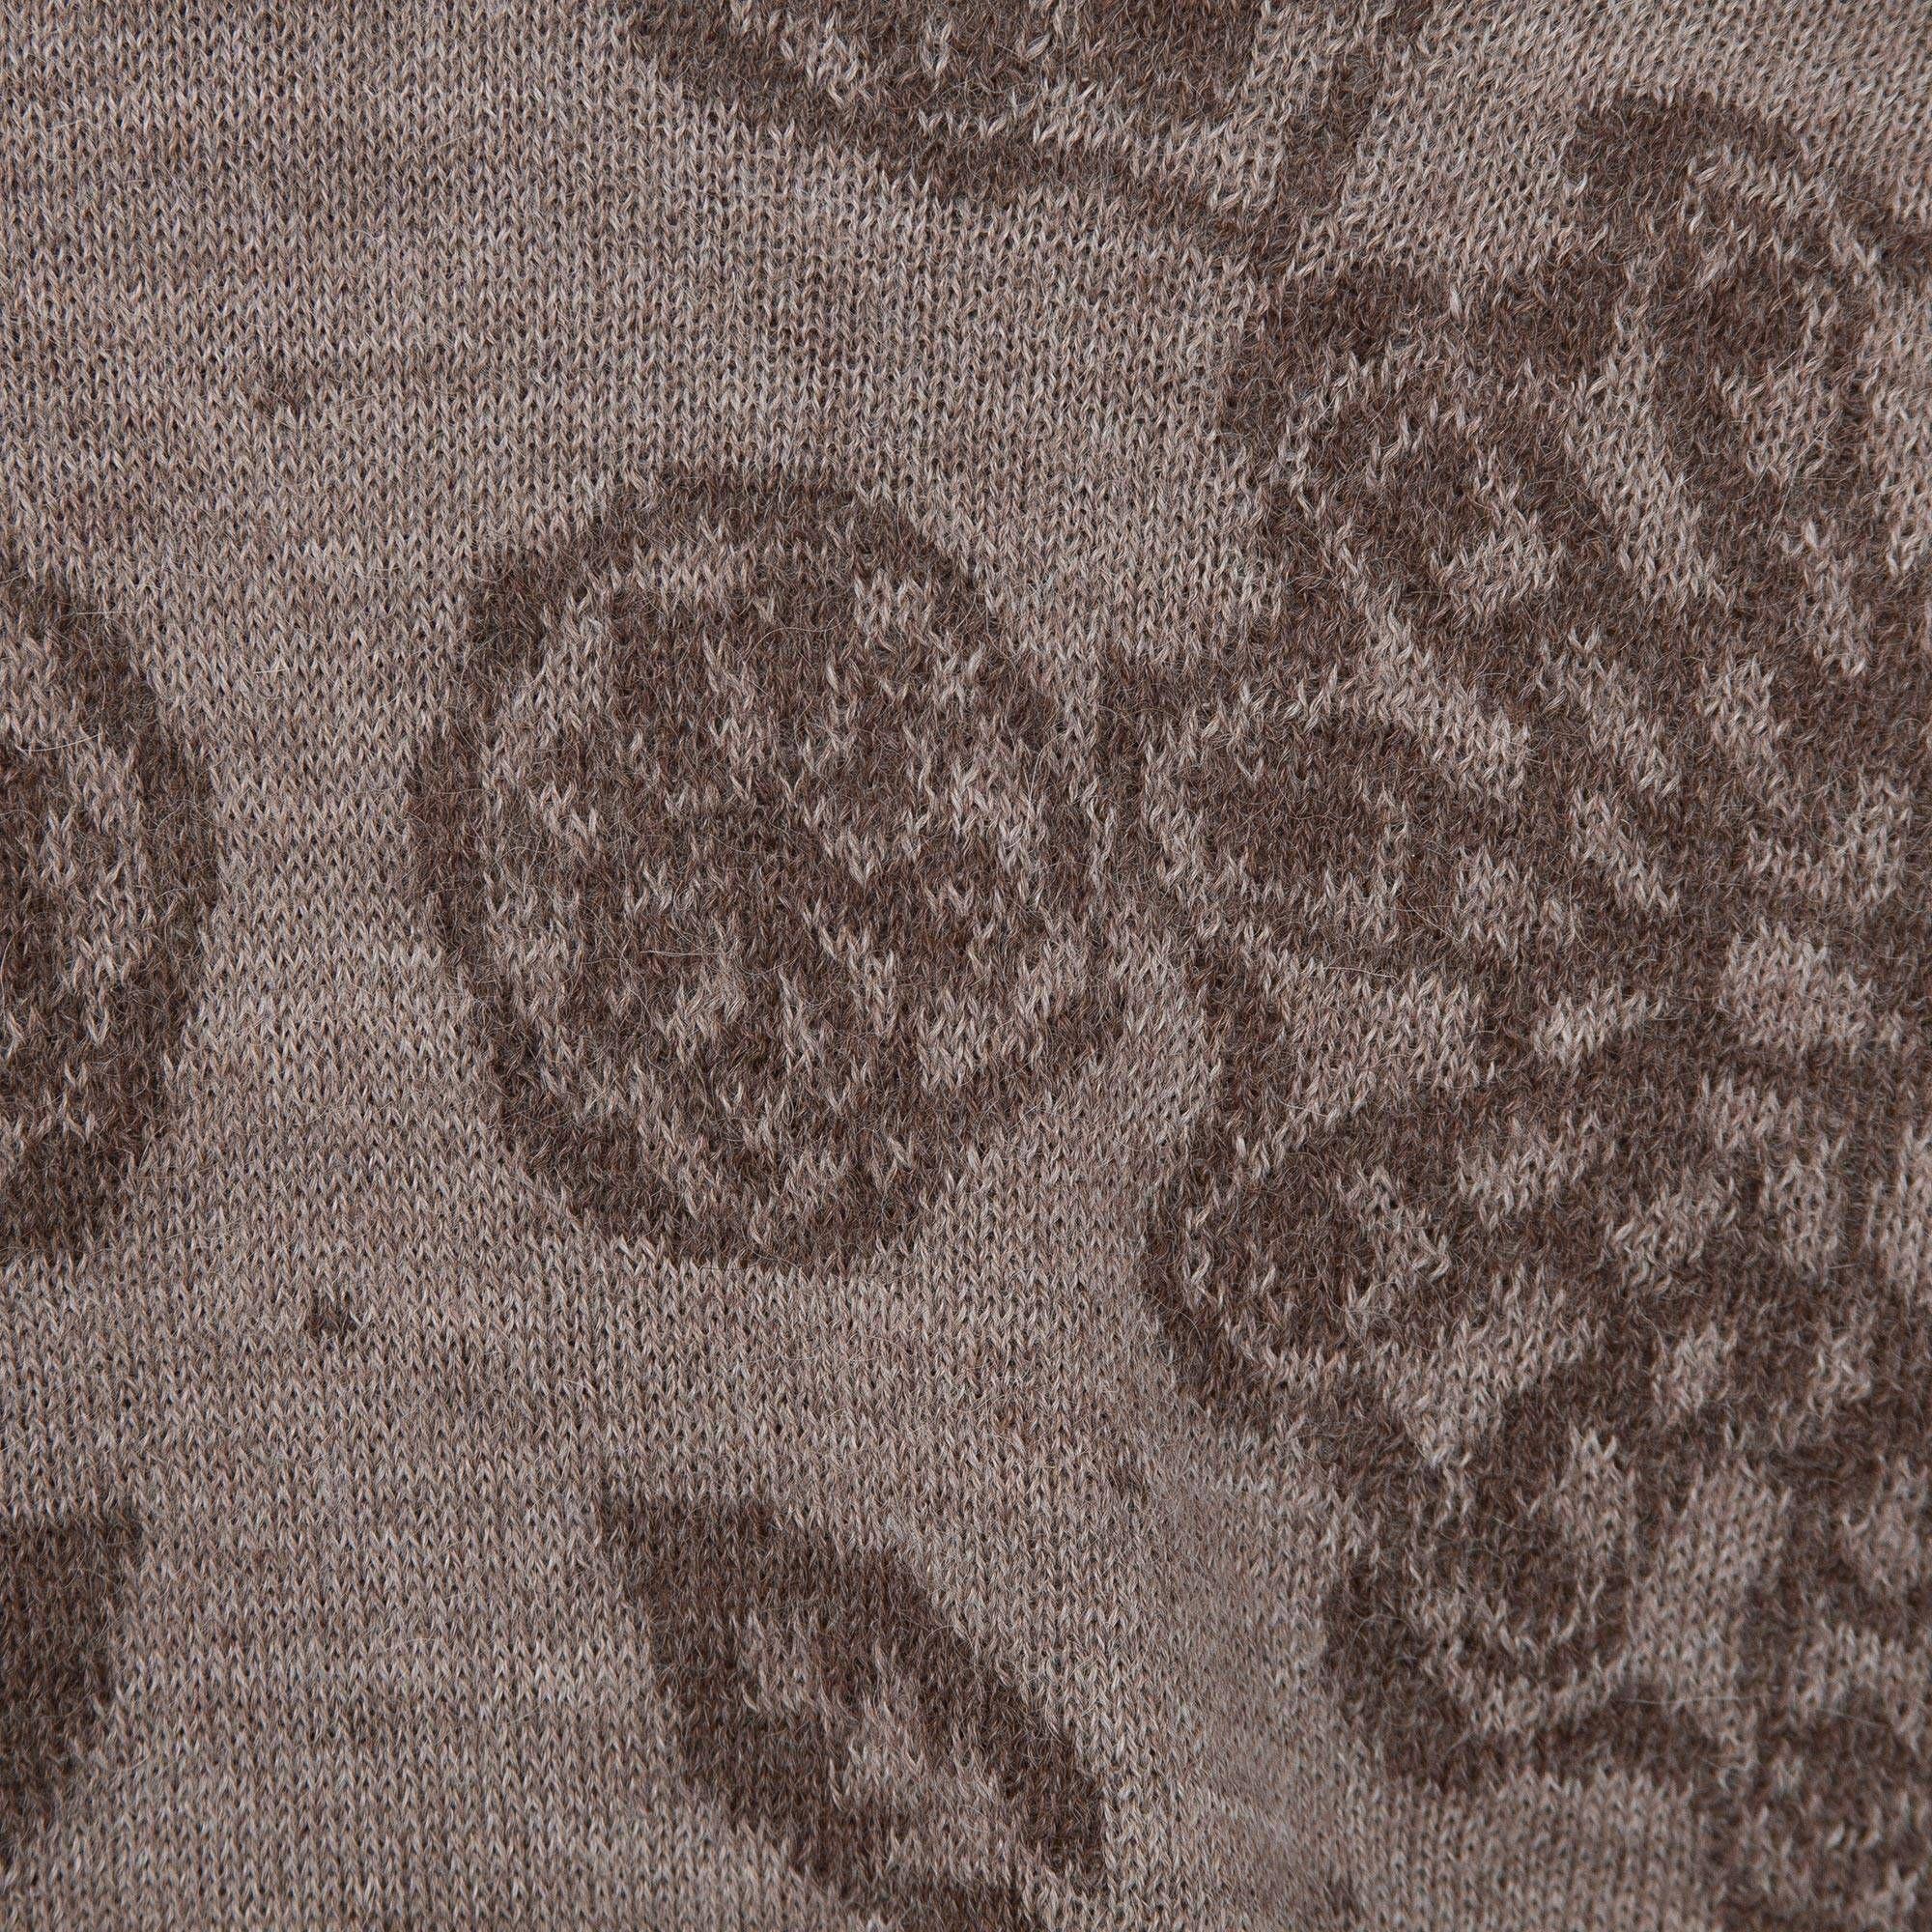 100 Baby Alpaca Sweater Jacket Floral Enchantment In 2020 Alpaca Sweater Baby Alpaca Knit Alpaca